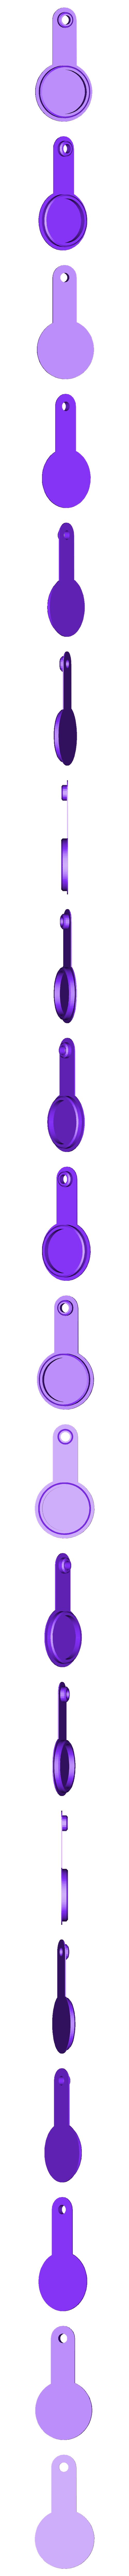 LLAVERO_SIN_LOGO_macho_NFC_.stl Télécharger fichier STL gratuit LLAVERO CELTA DE VIGO, REAL MADRID, BARCELONA, ATLETICO DE MADRID Y TORTUGA (NFC) • Modèle imprimable en 3D, celtarra12